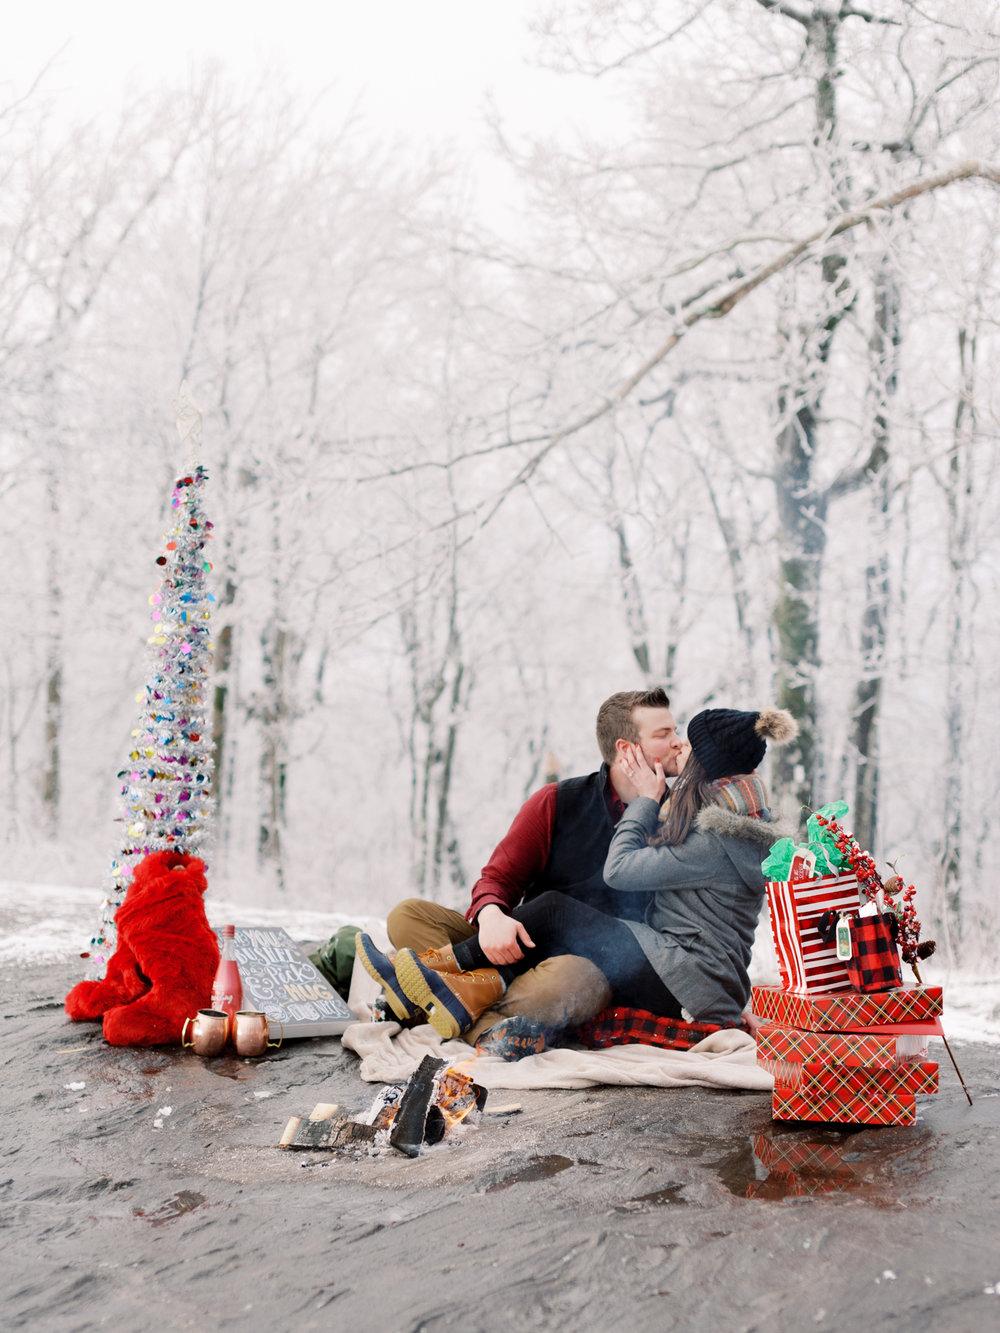 snowy-georgia-proposal-preachers-rock-atlanta-dahlonega-wedding-photographer-hannah-forsberg-fine-art-film-45.jpg